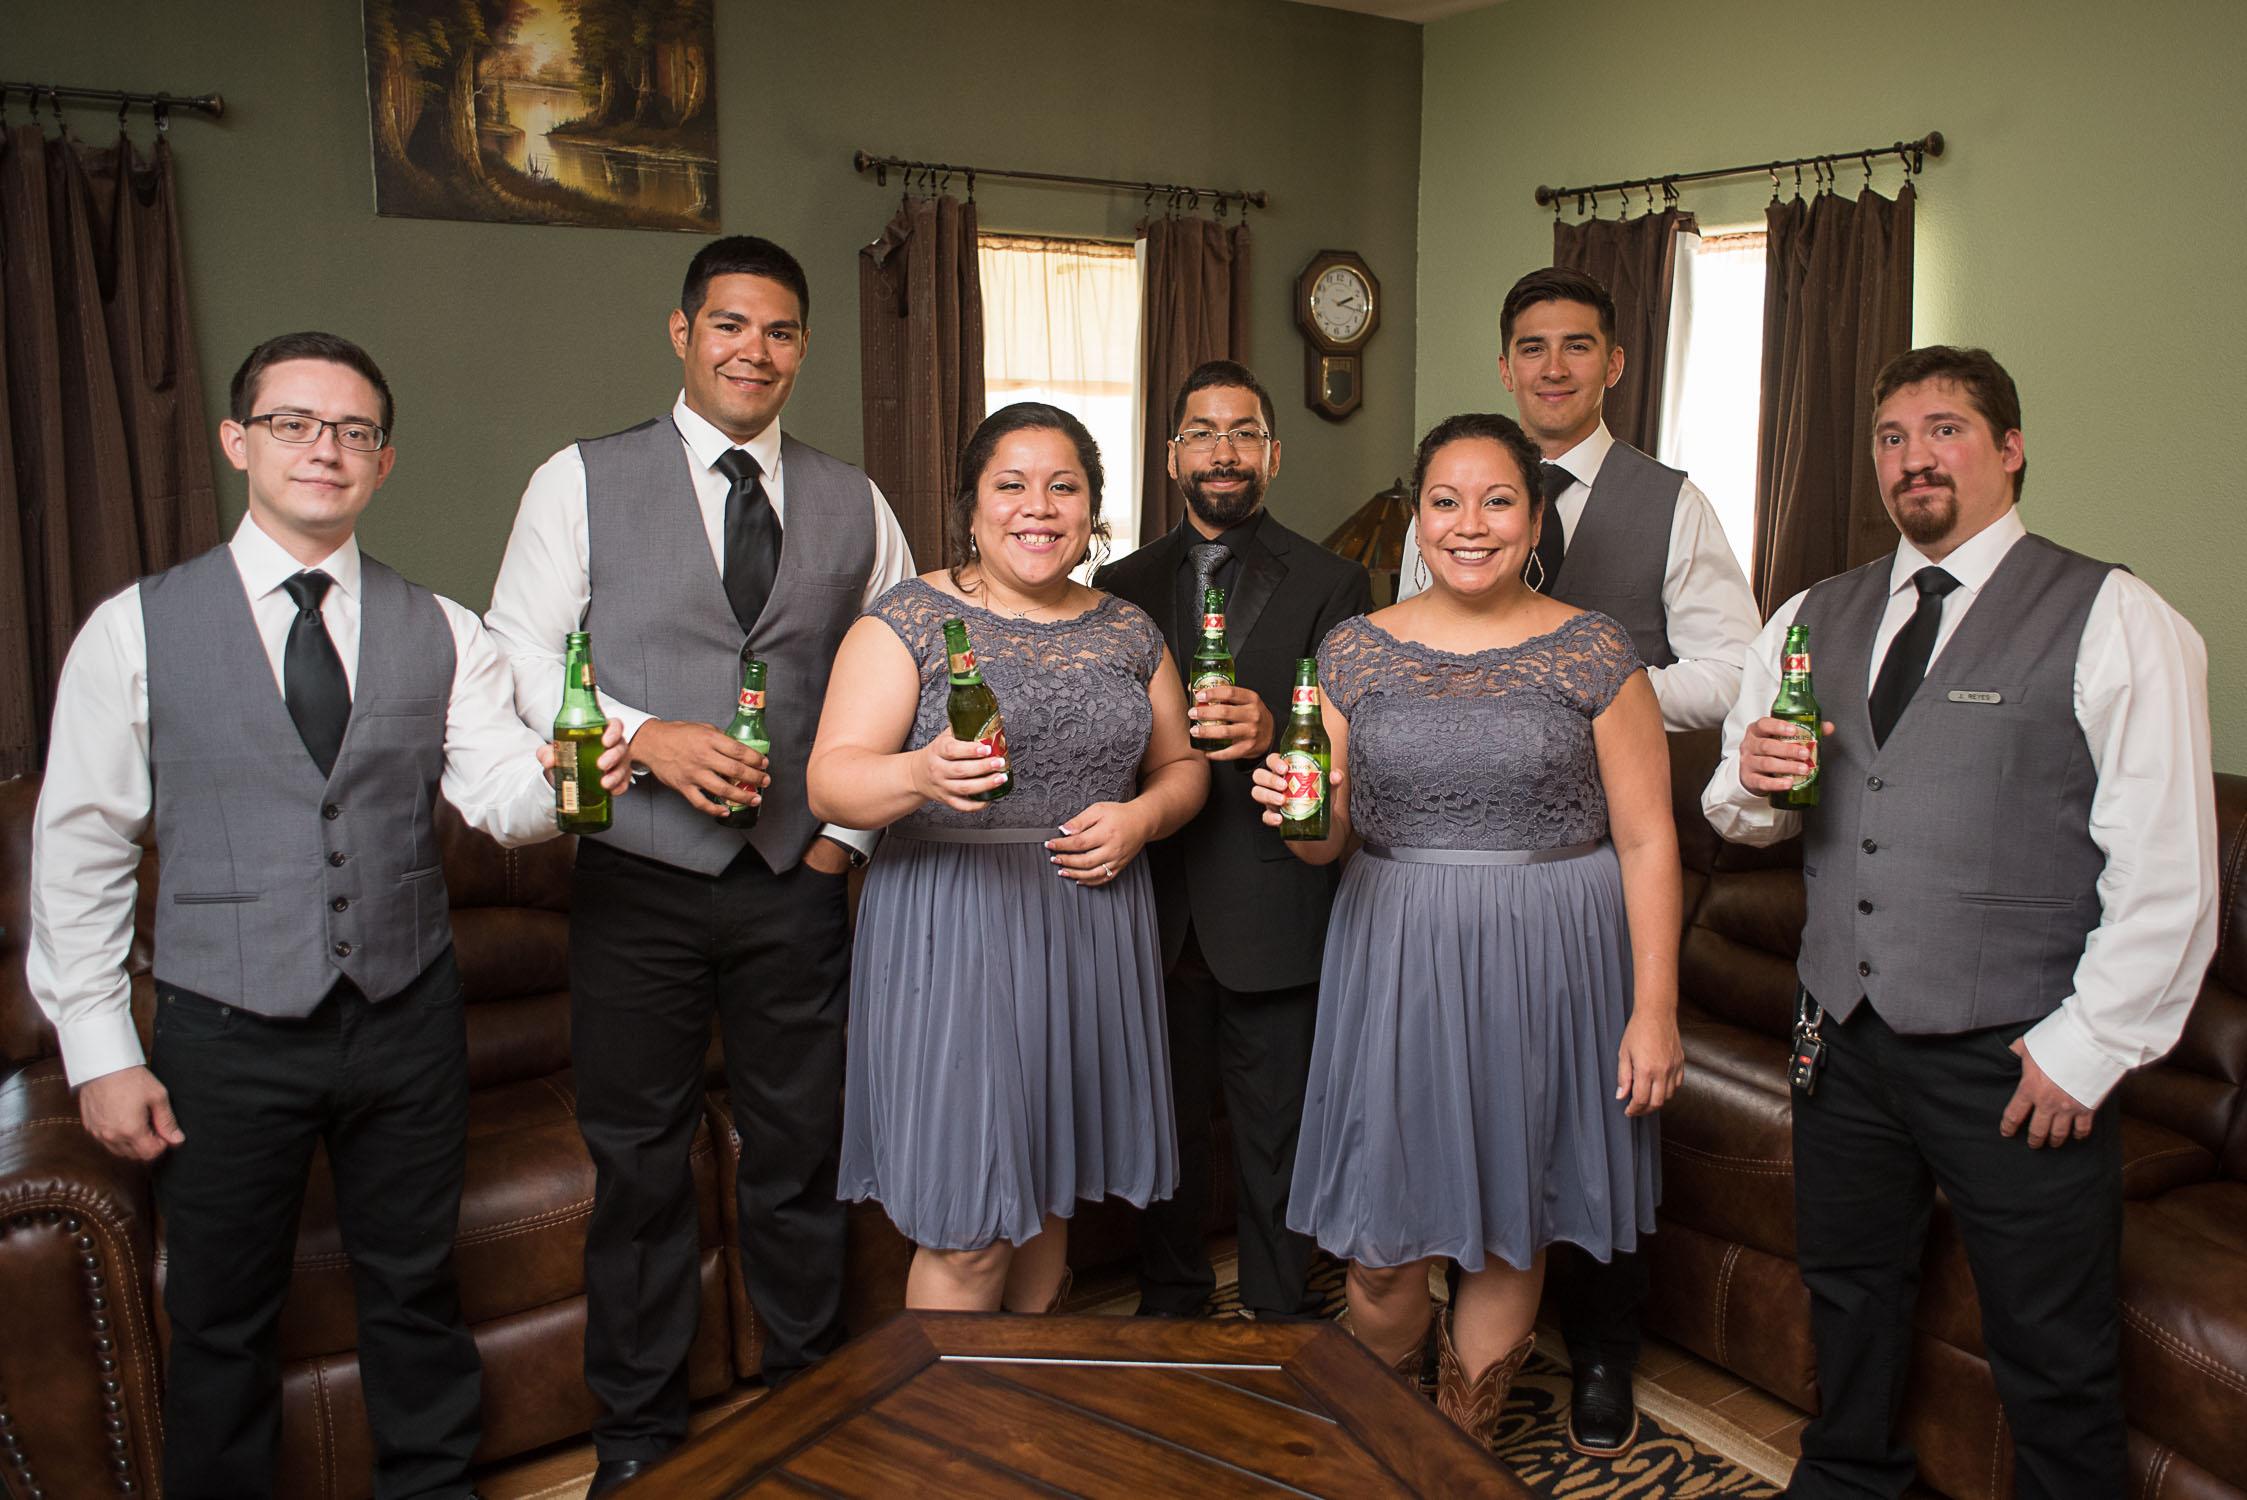 Leal Wedding Mira Visu Photography-44.jpg